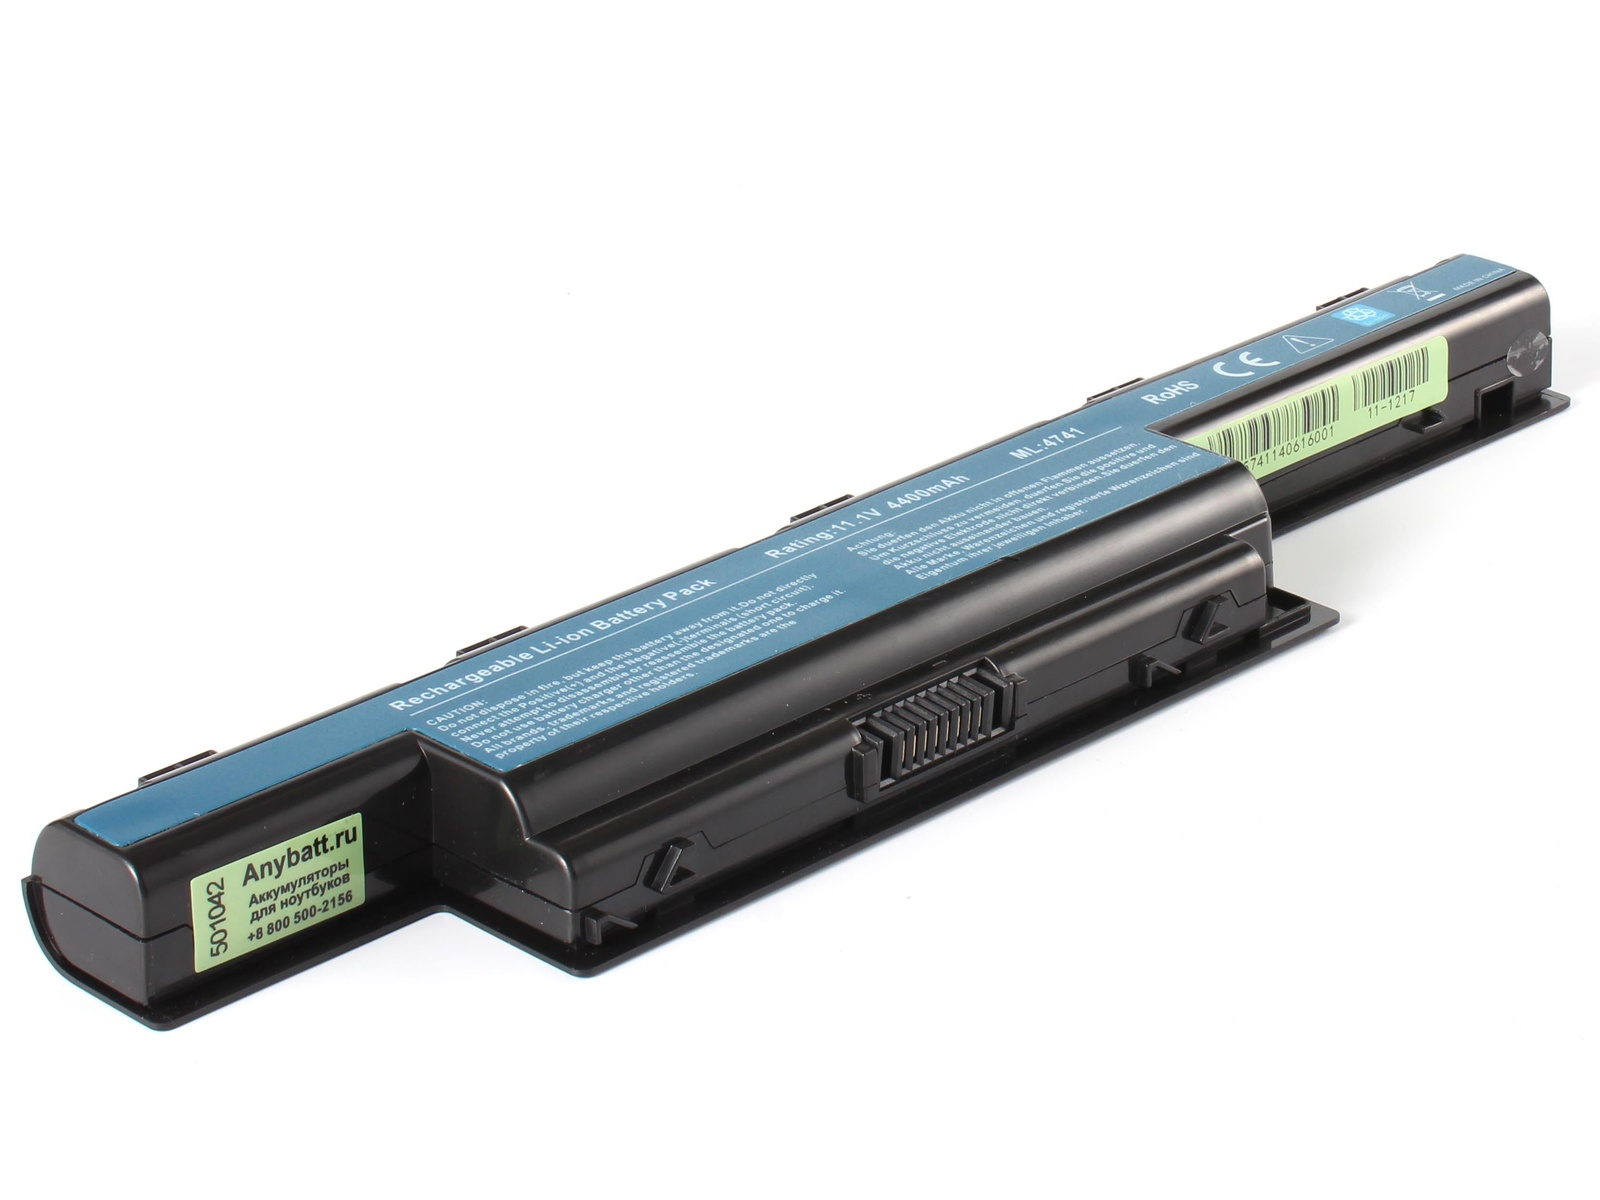 Аккумулятор для ноутбука AnyBatt для Acer Aspire 7750ZG-B953G50Mnkk, Aspire 5736Z, Aspire 7750G-2456G75Mnkk, Aspire 5336-T352G25MIkk, Aspire V3-571G-33114G50Makk, Aspire V3-571G-73638G75Ma, Aspire 4750G, Aspire 5250-E303G50Mikk wholesale for acer aspire 5736z 5736 5336 motherboard la 6631p 100% work perfect